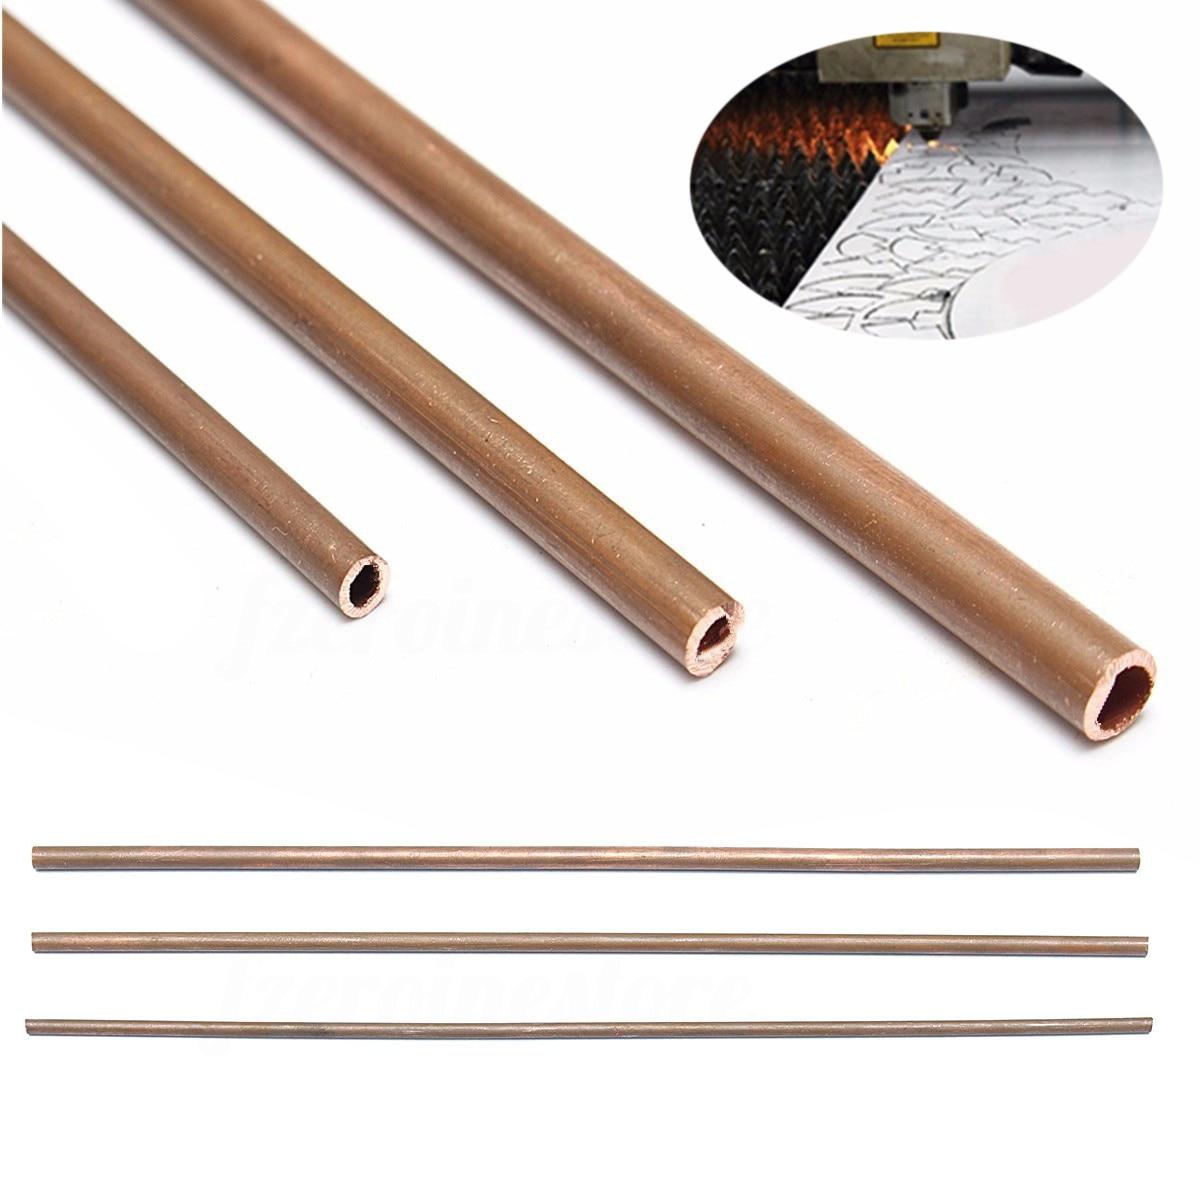 1pc New Copper Tube Plumbing Pipe DIY Rod 3mm/4mm/5mm Inner Diameter 300mm Length free shipping 20pcs lot 6mm diameter 300mm length notebook pure copper heat pipe radiator diy sintering radiator copper tube